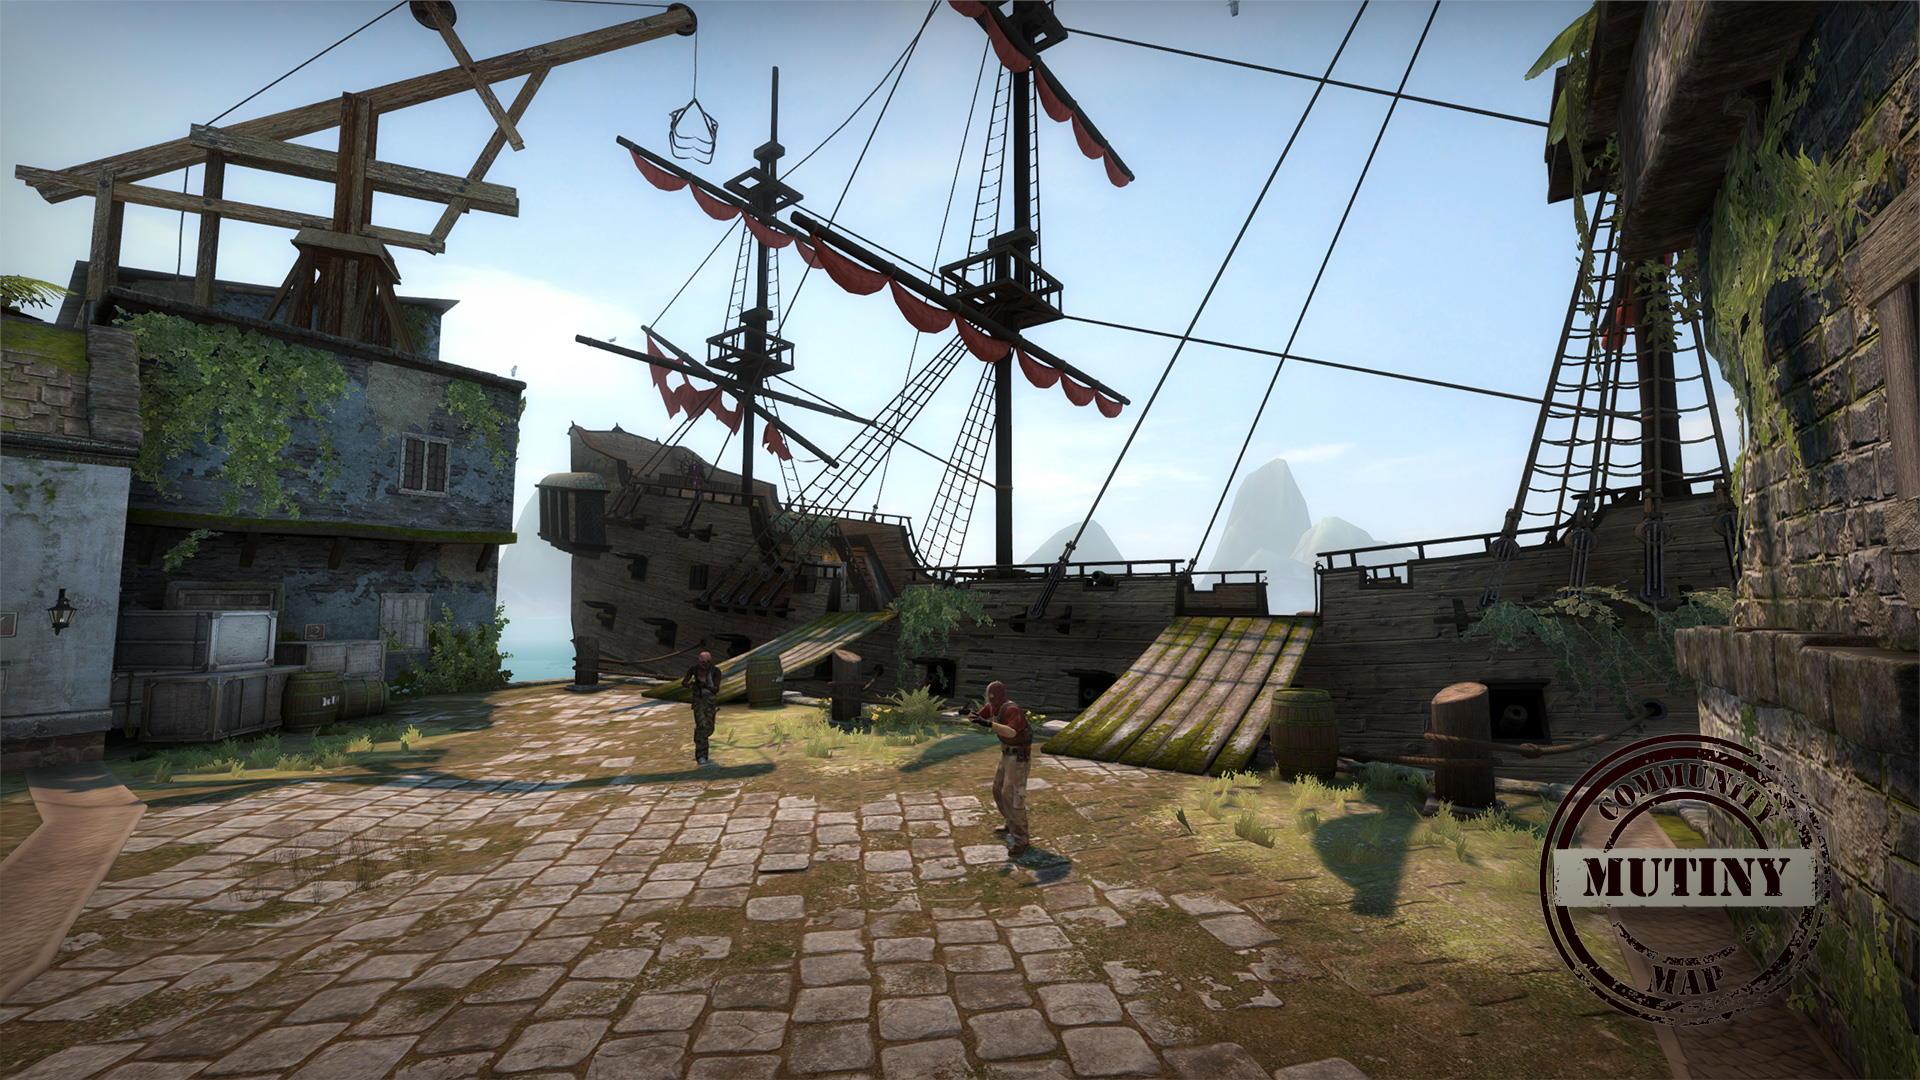 CS:GO Mutiny